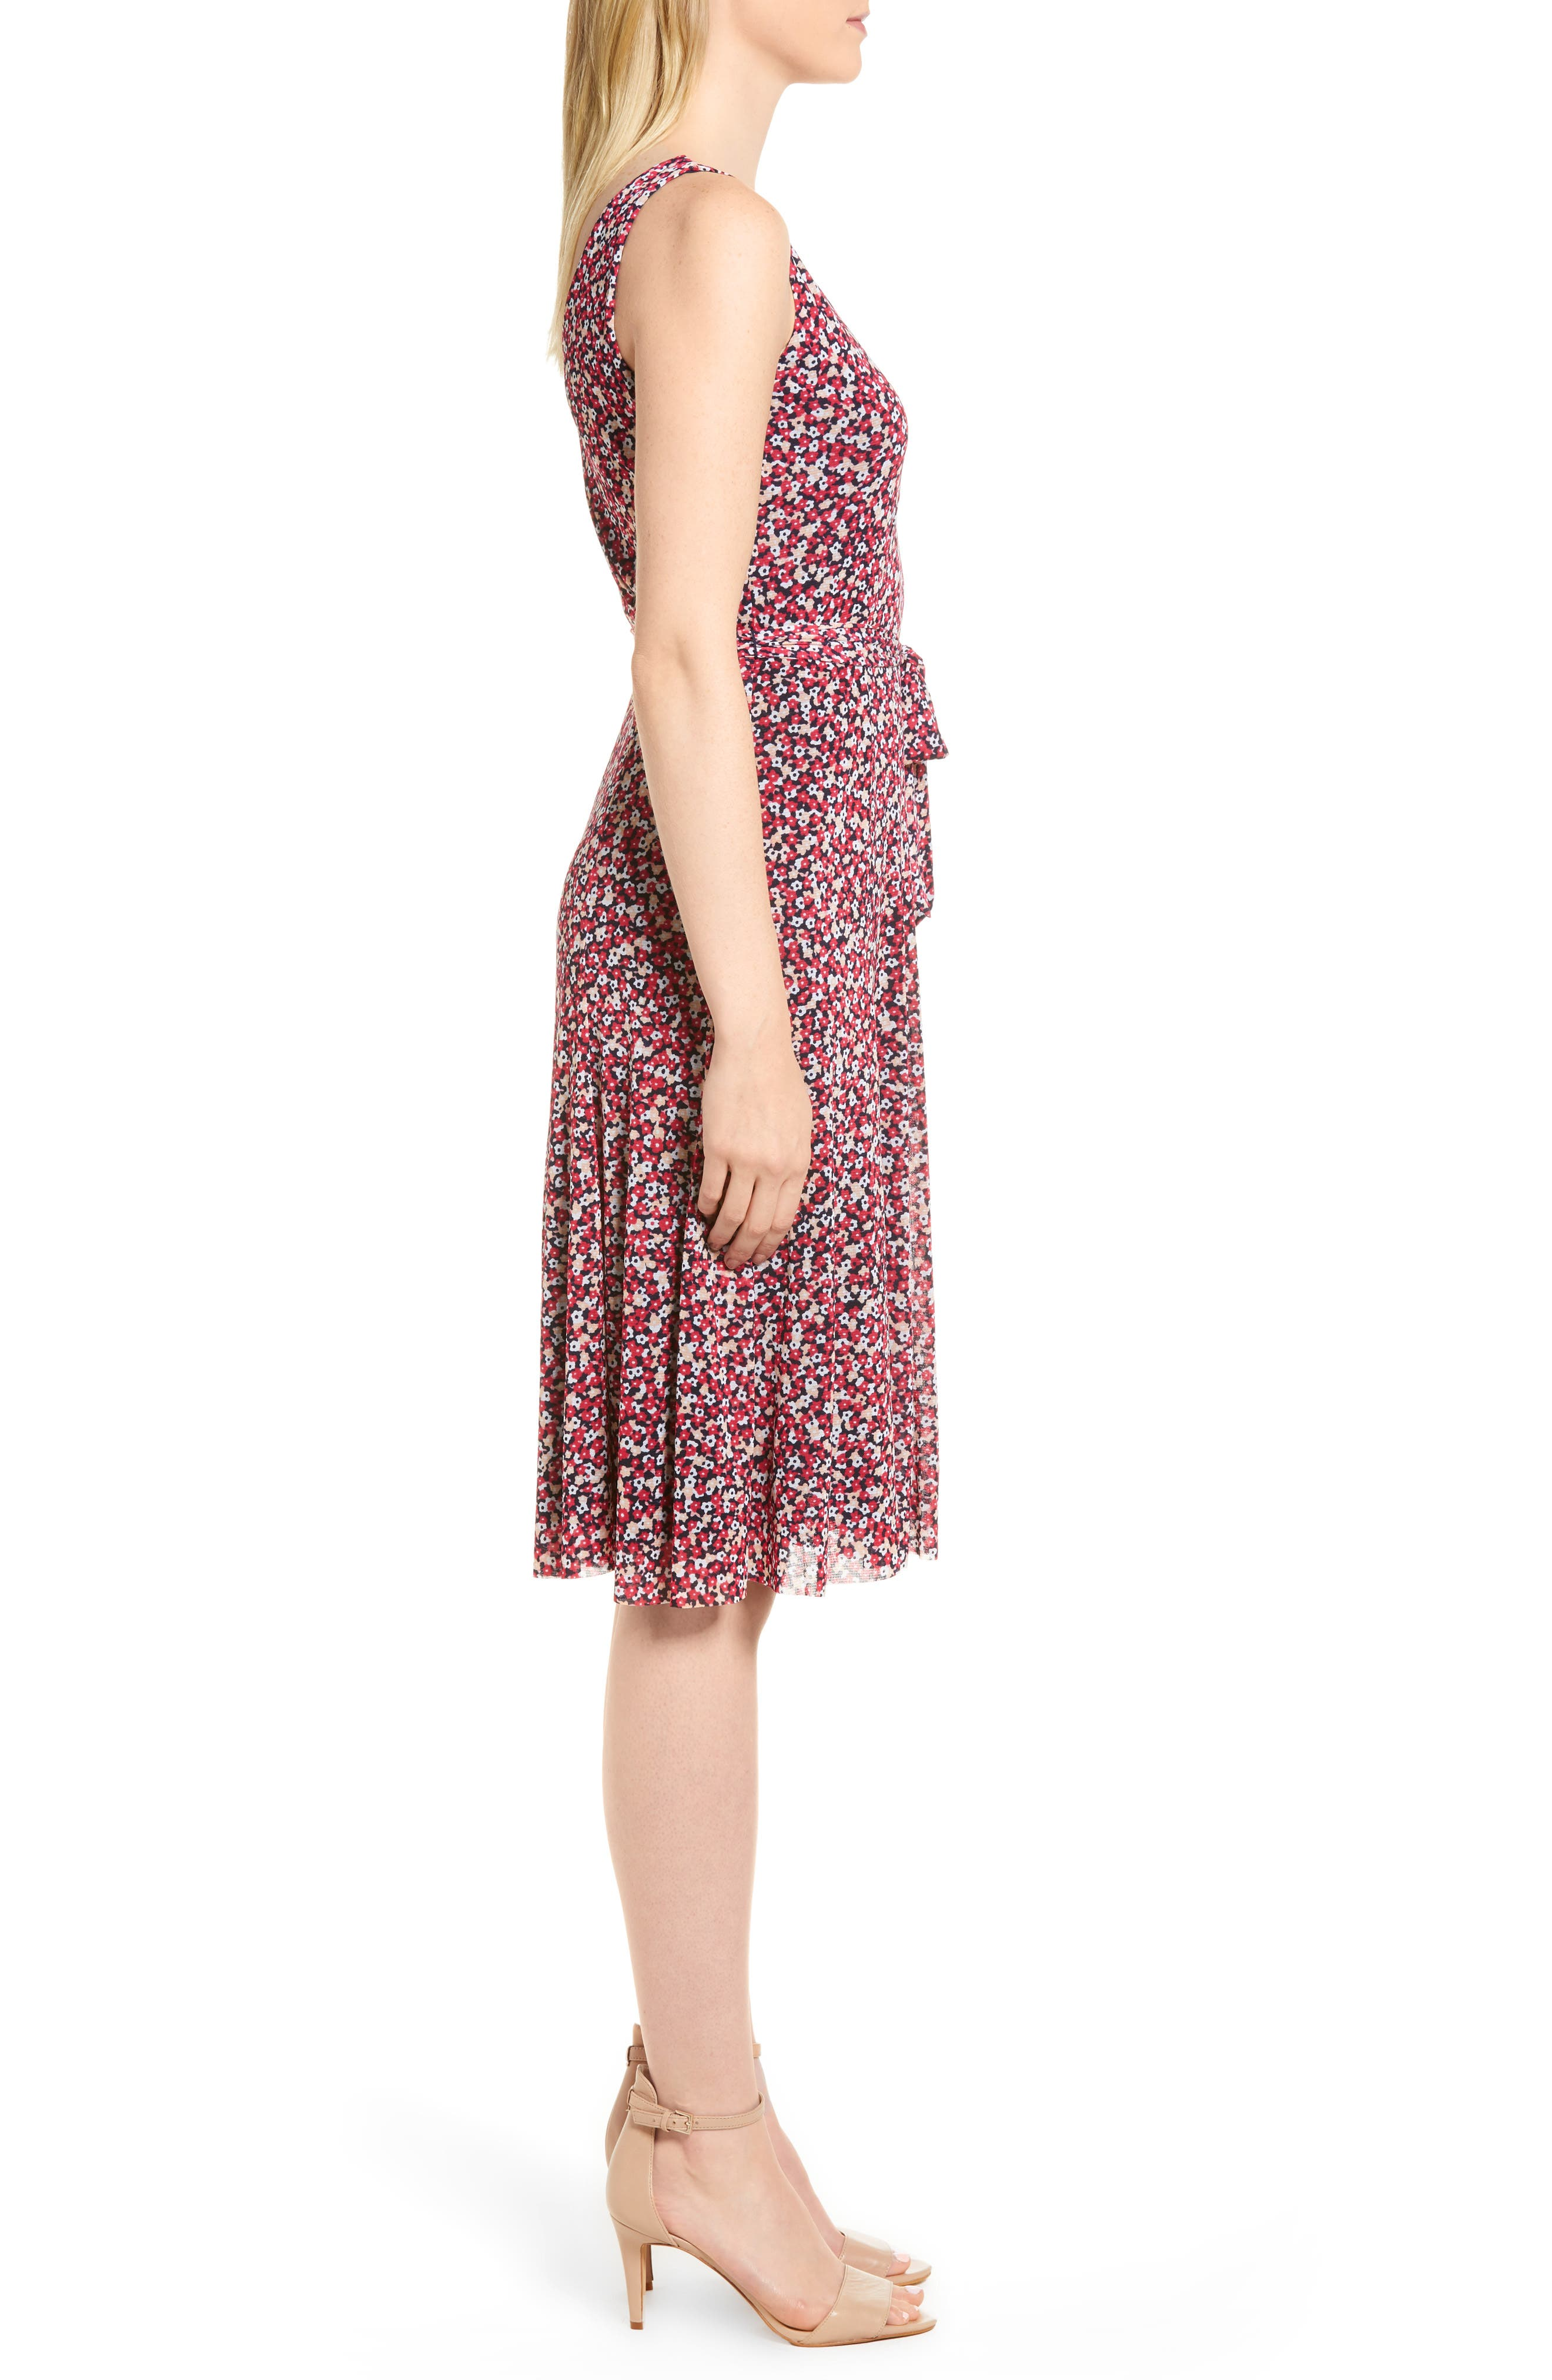 Floral Tank Dress,                             Alternate thumbnail 3, color,                             True Navy/ Bright Blush